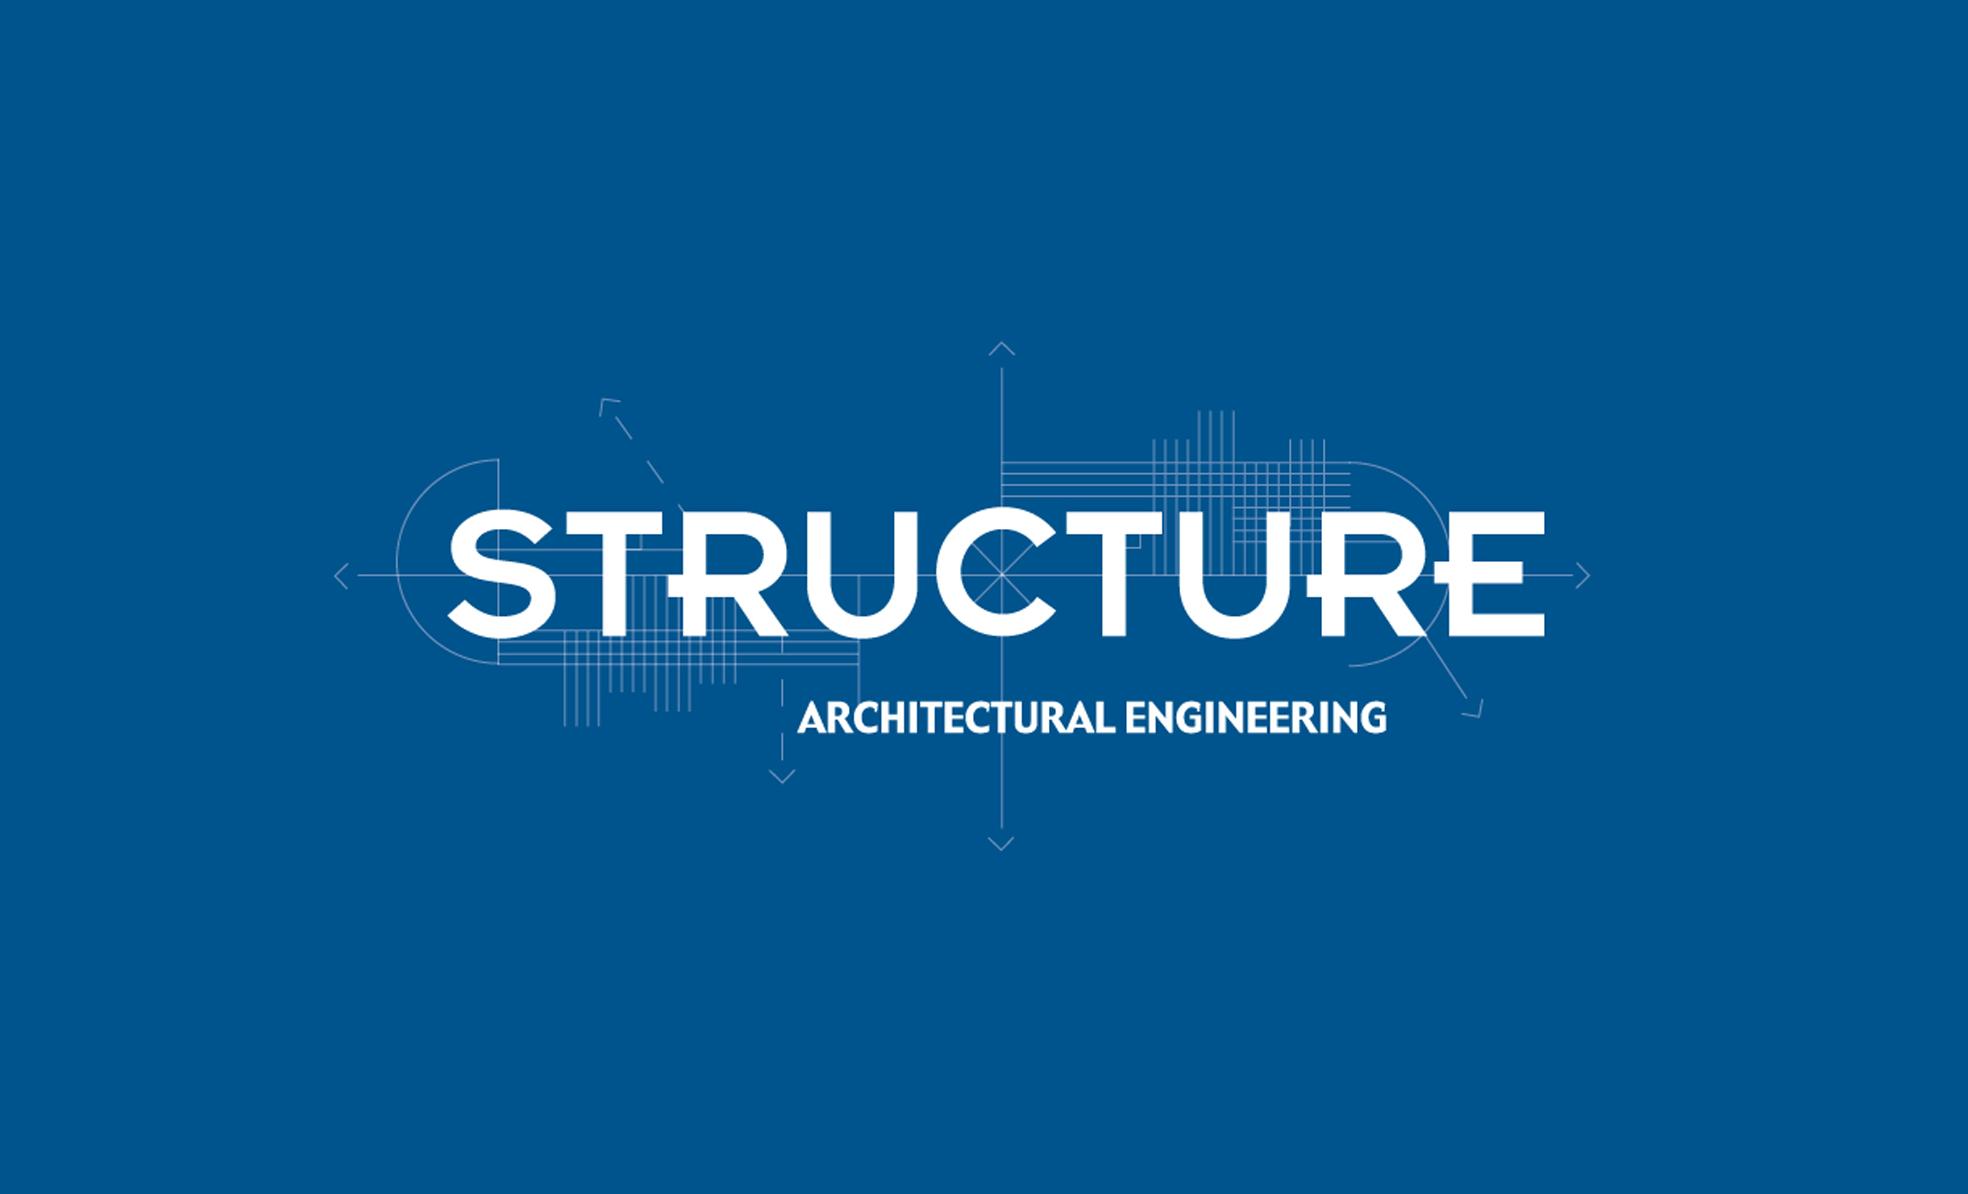 structure-architecture-logo-design-blueprint